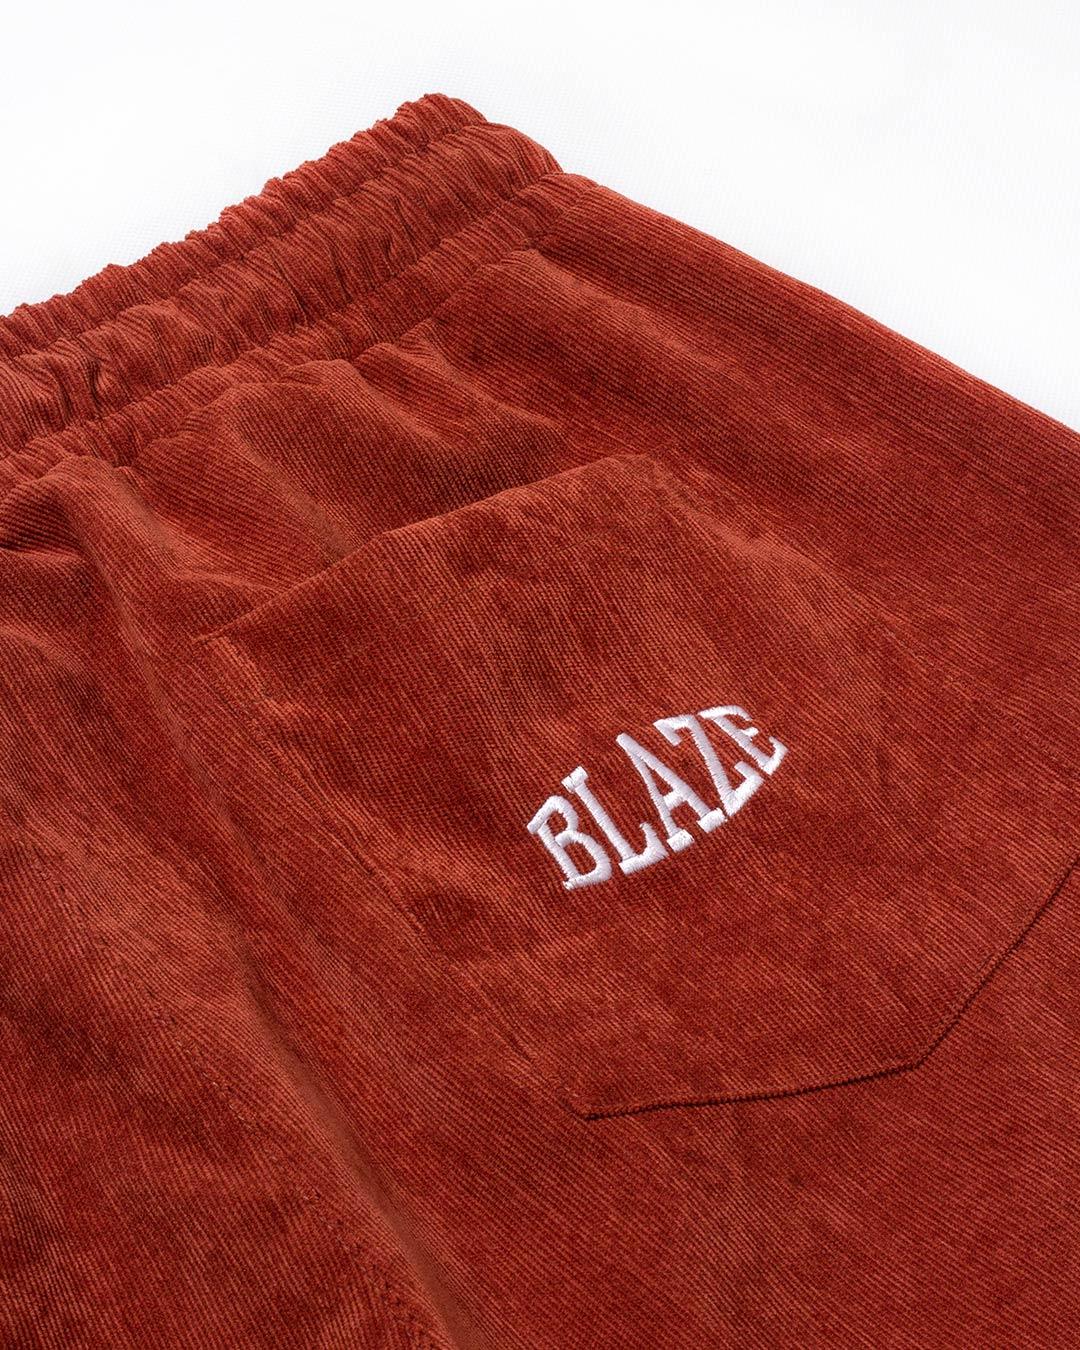 Calça Chino Compact Brown Blaze Supply